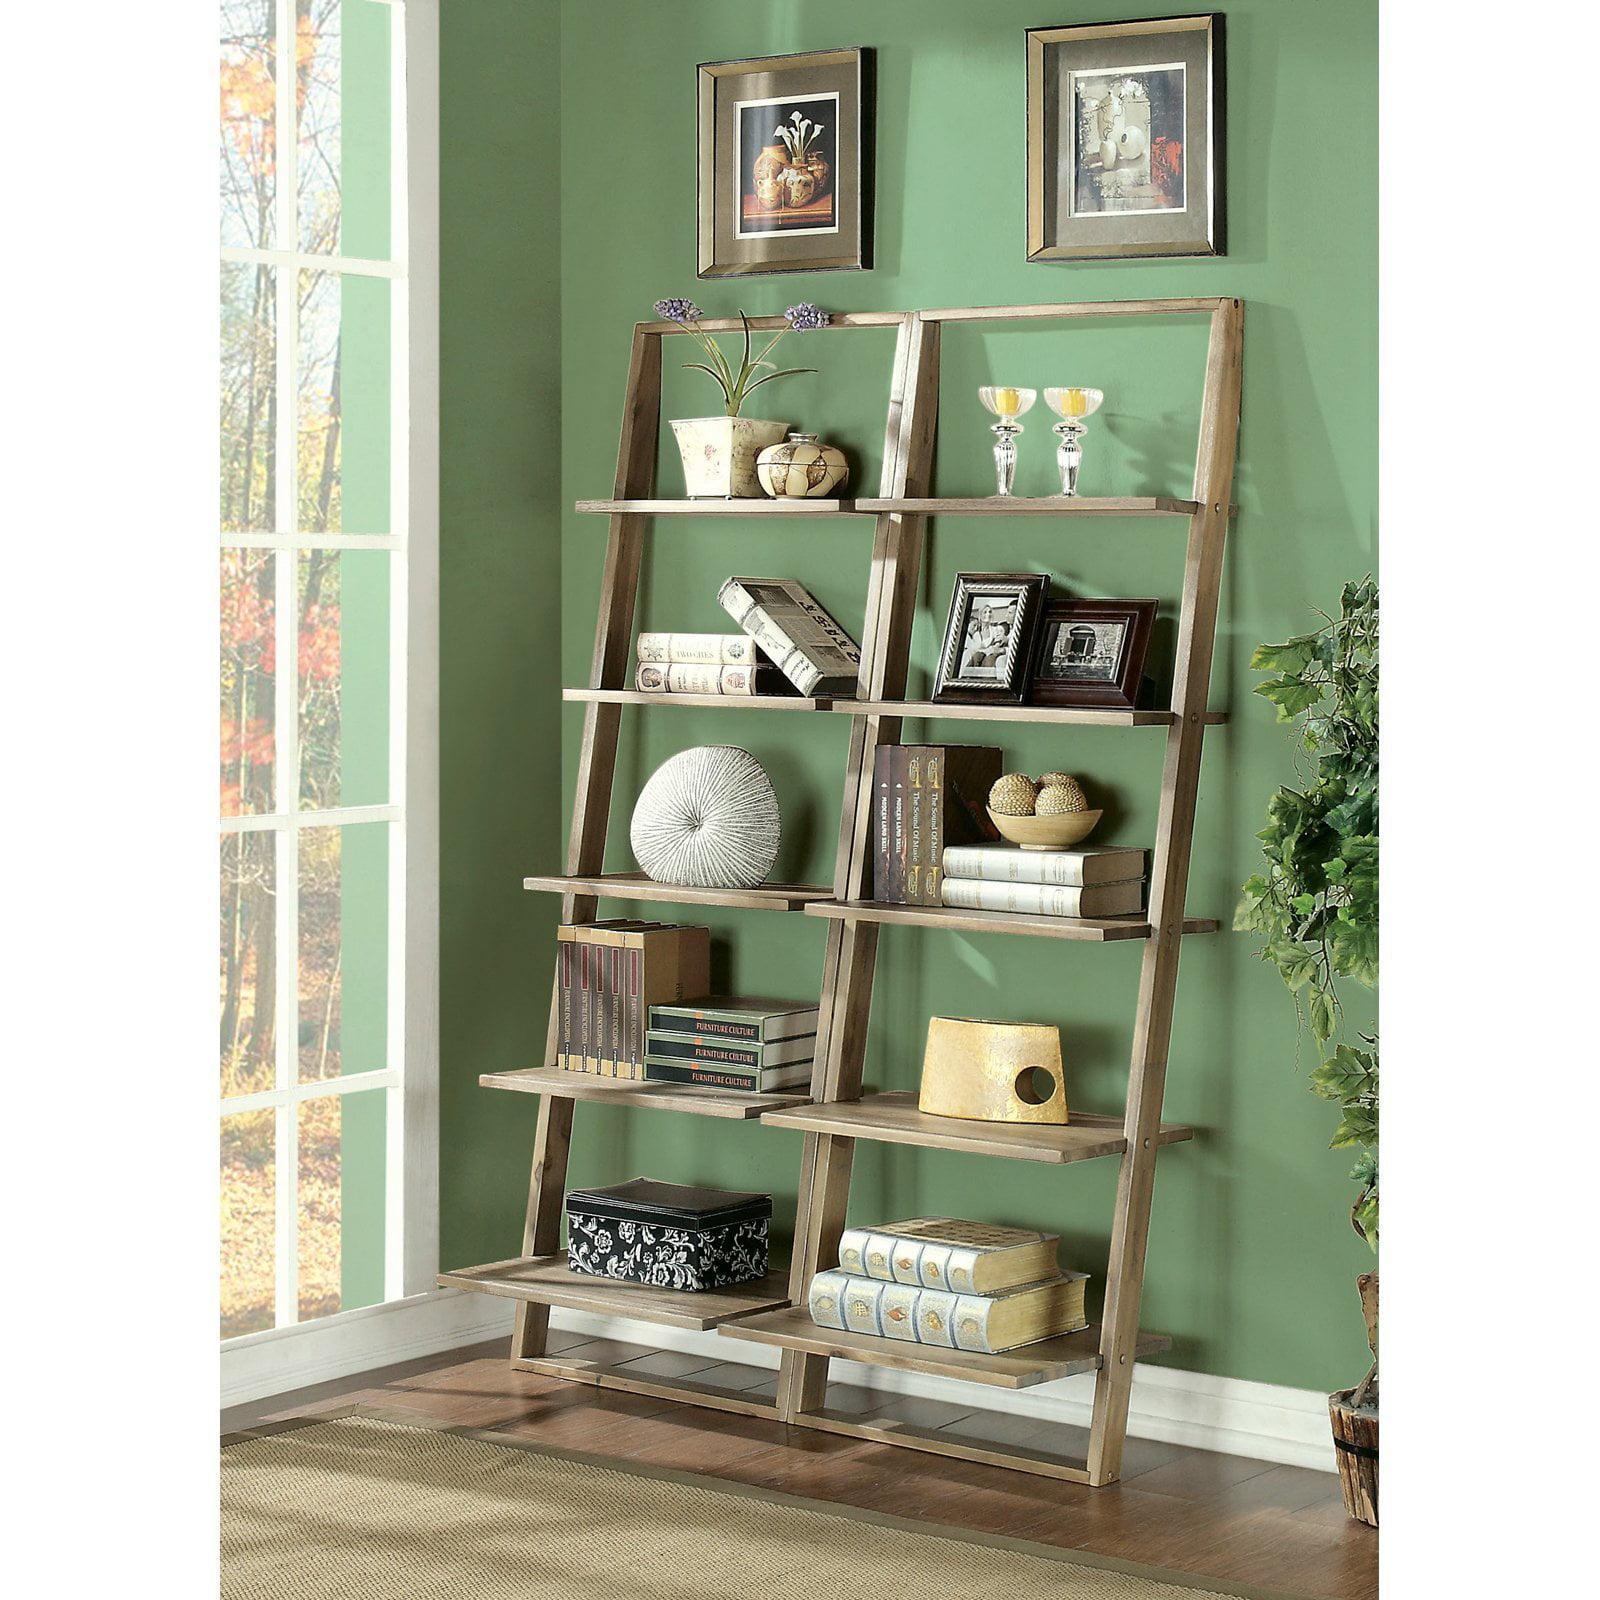 Riverside Lean Living Leaning Bookcase